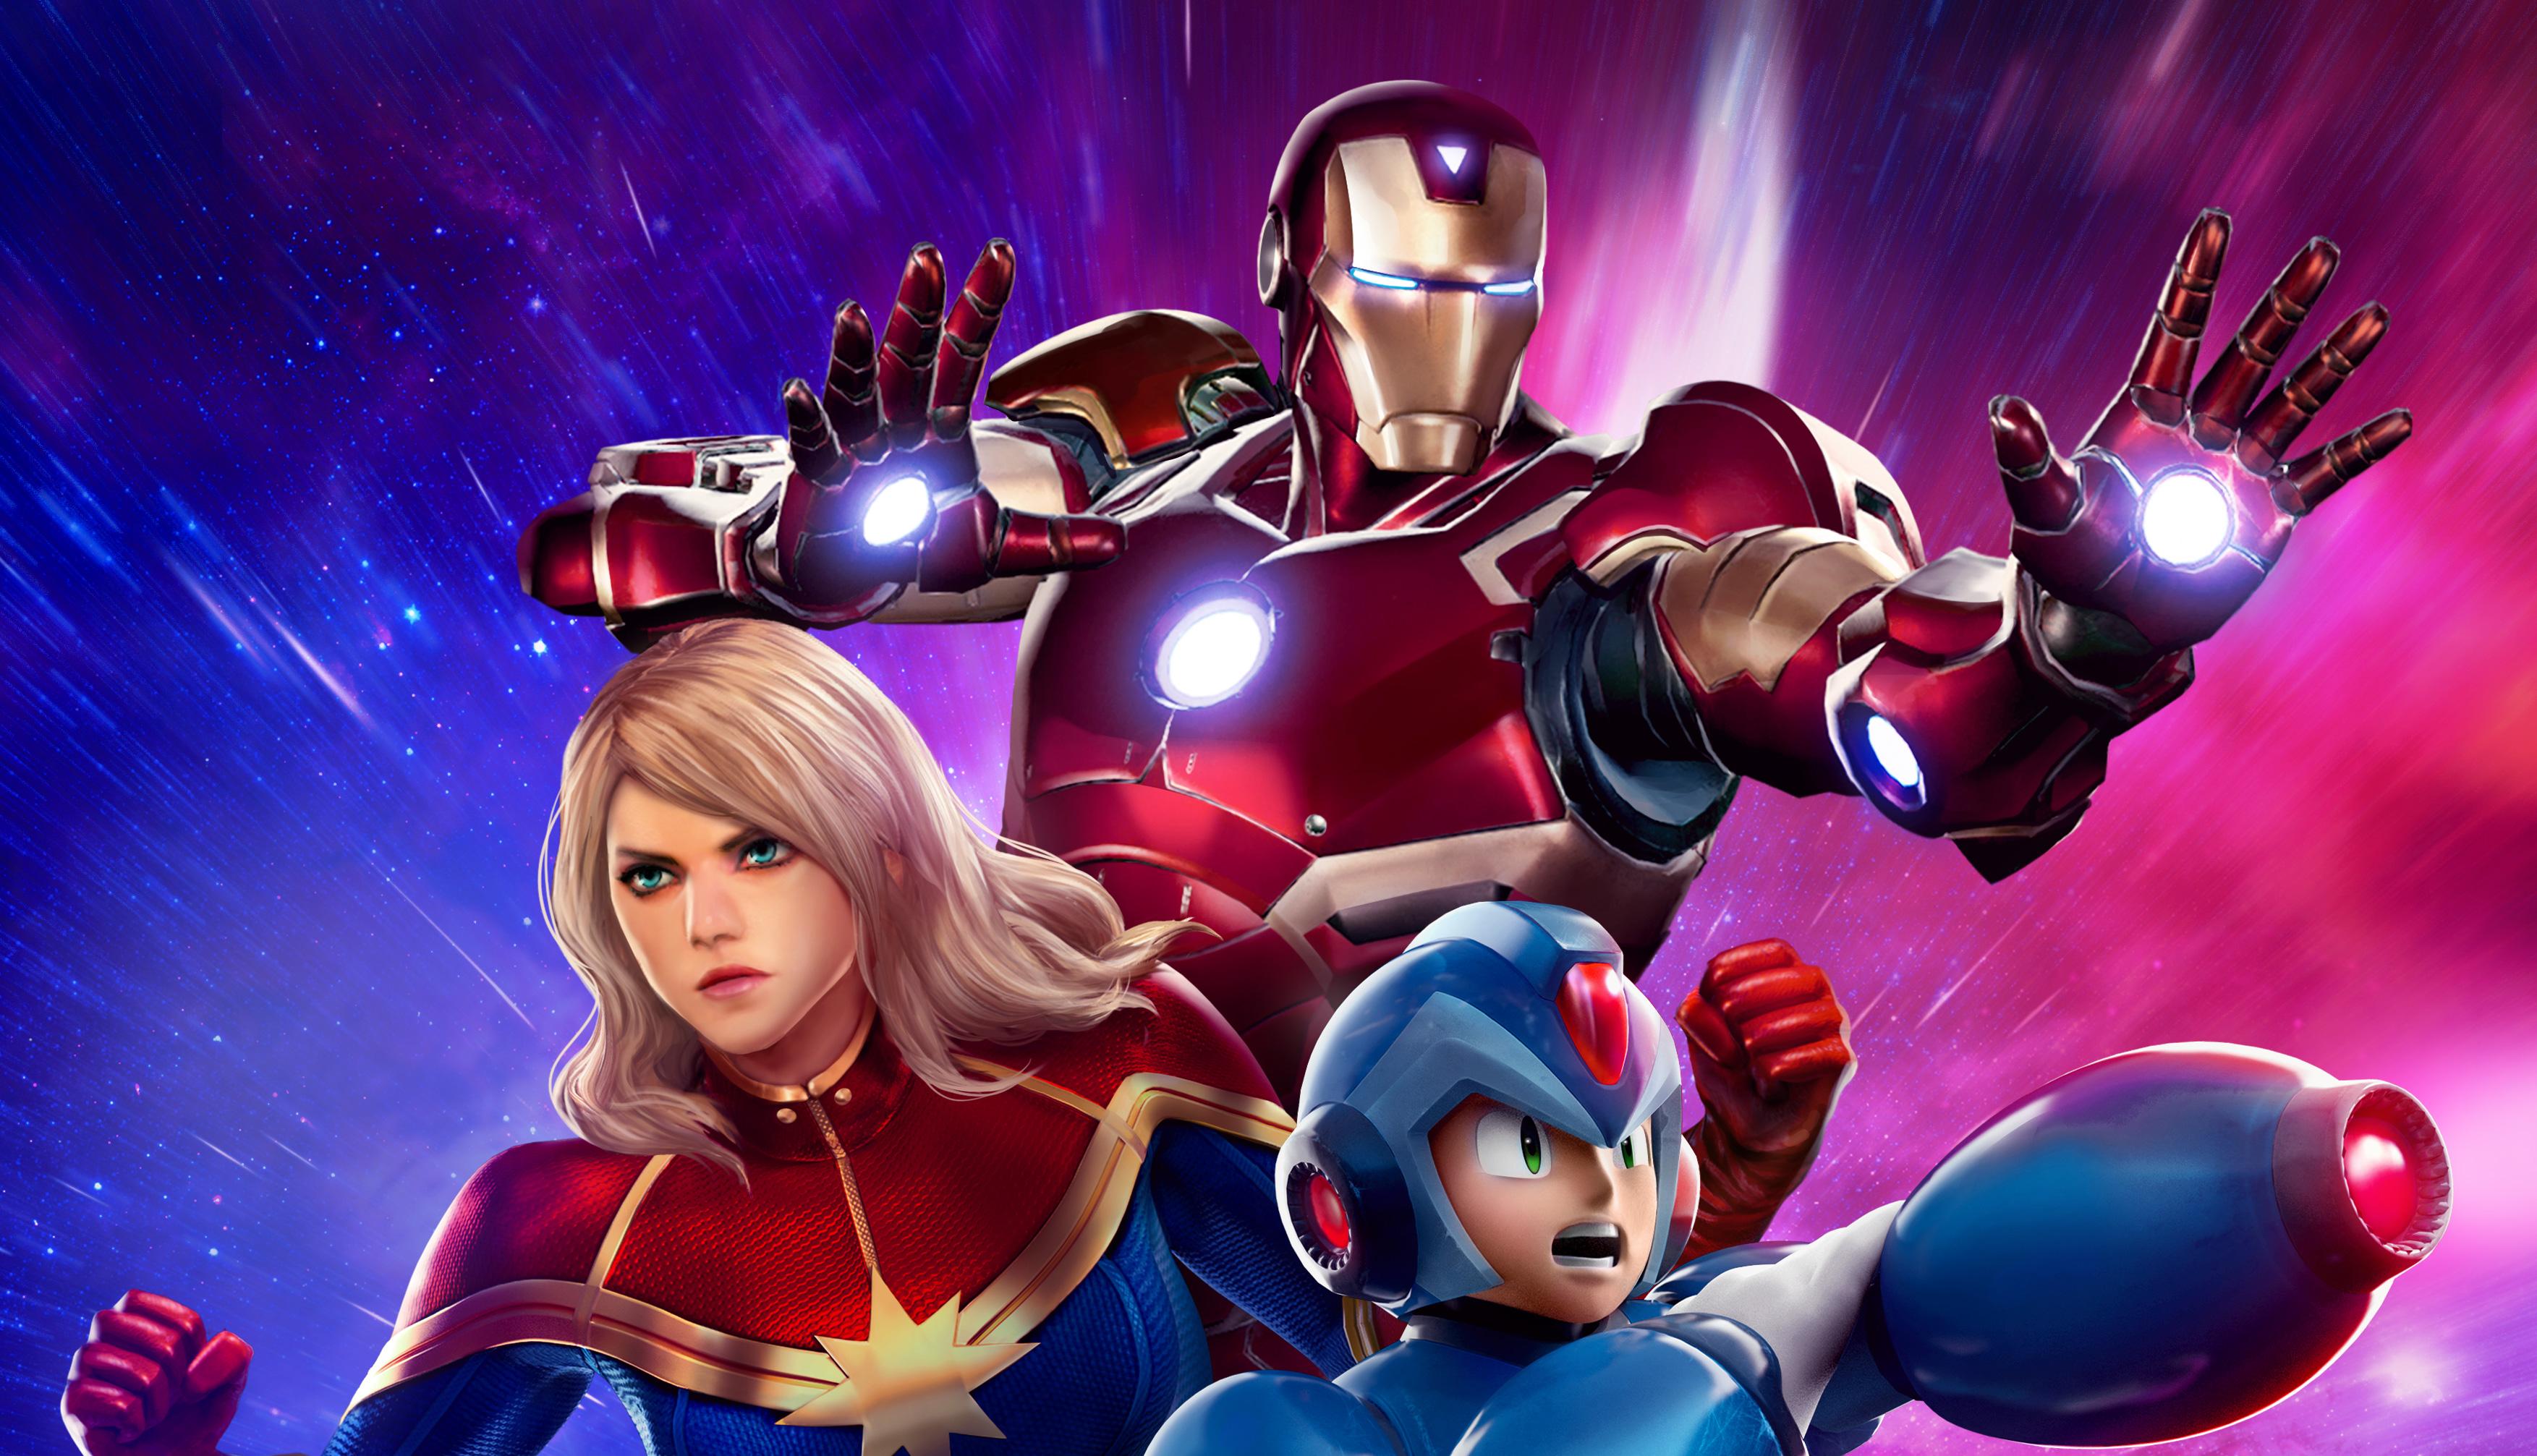 Marvel Vs Capcom Infinite Story Hd Games 4k Wallpapers Images